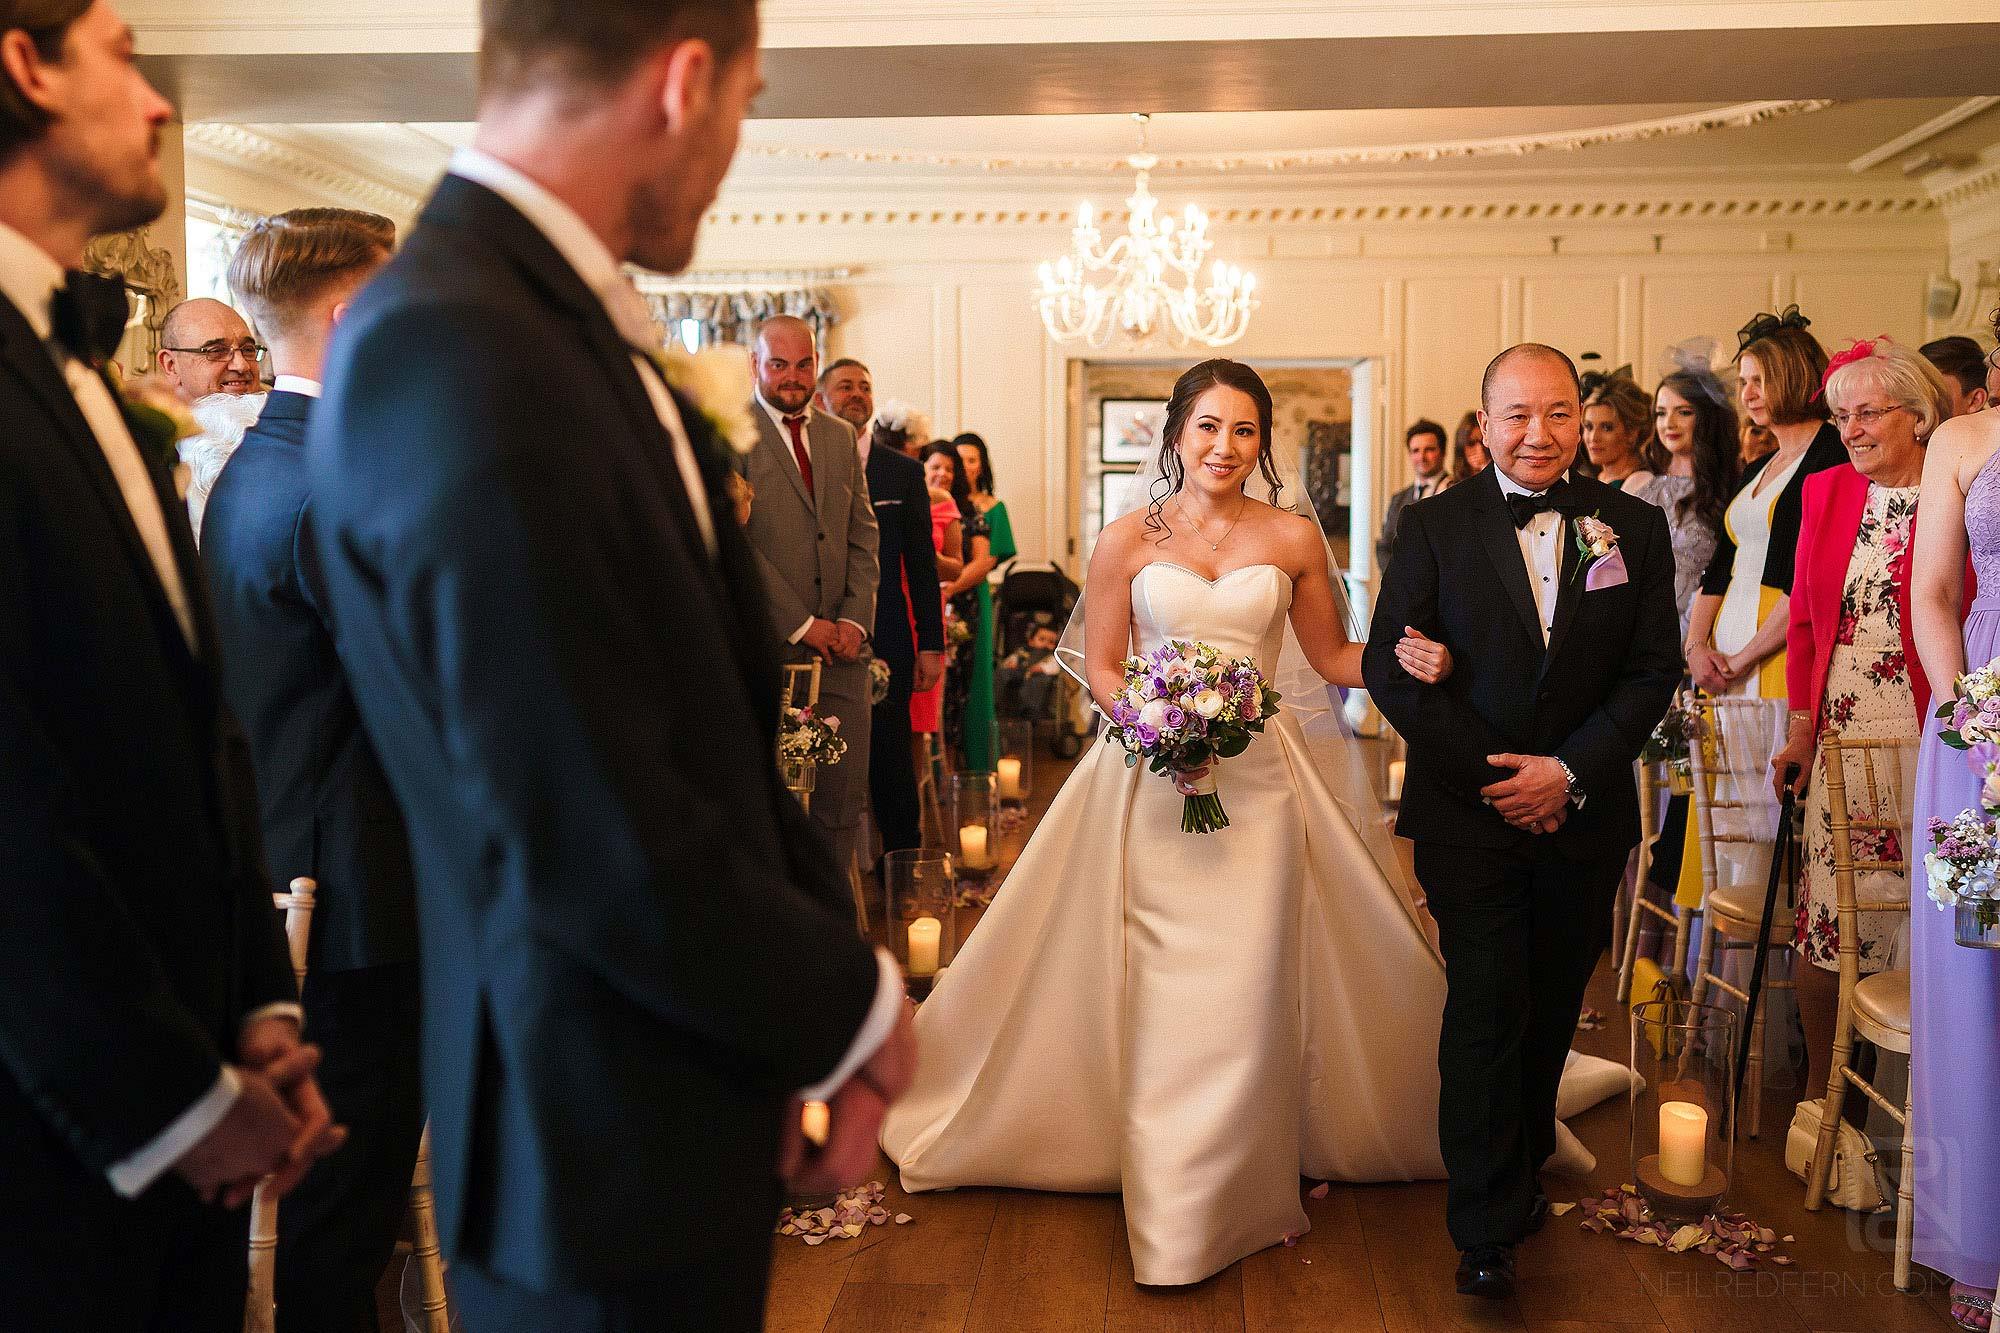 bride walking down the aisle at Eaves Hall